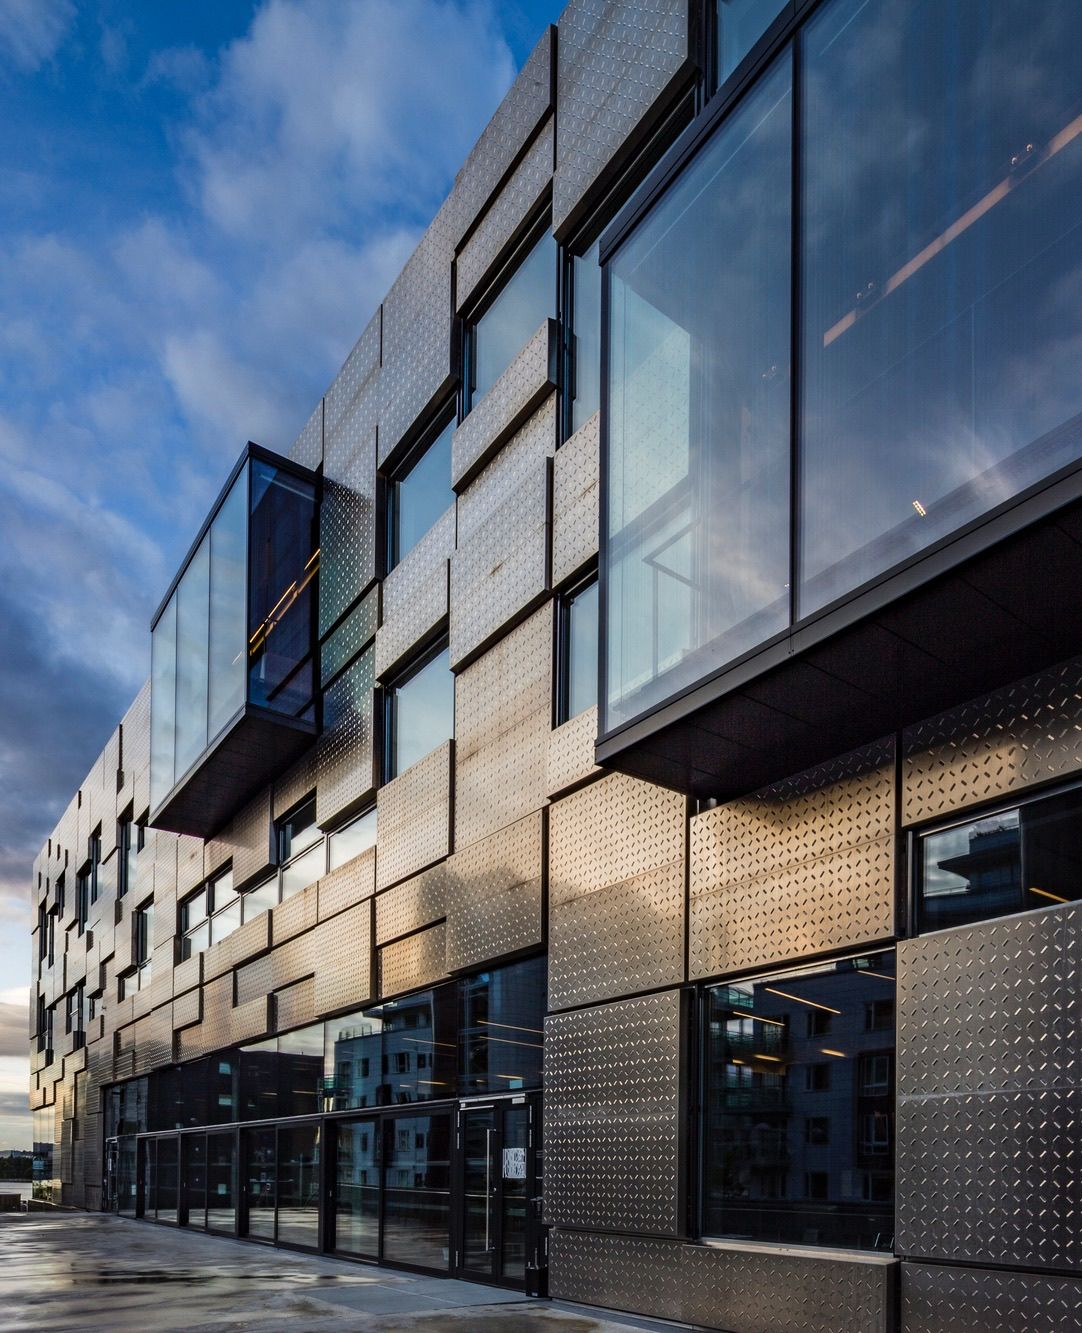 bergen welcomes snhetta designed faculty of fine art